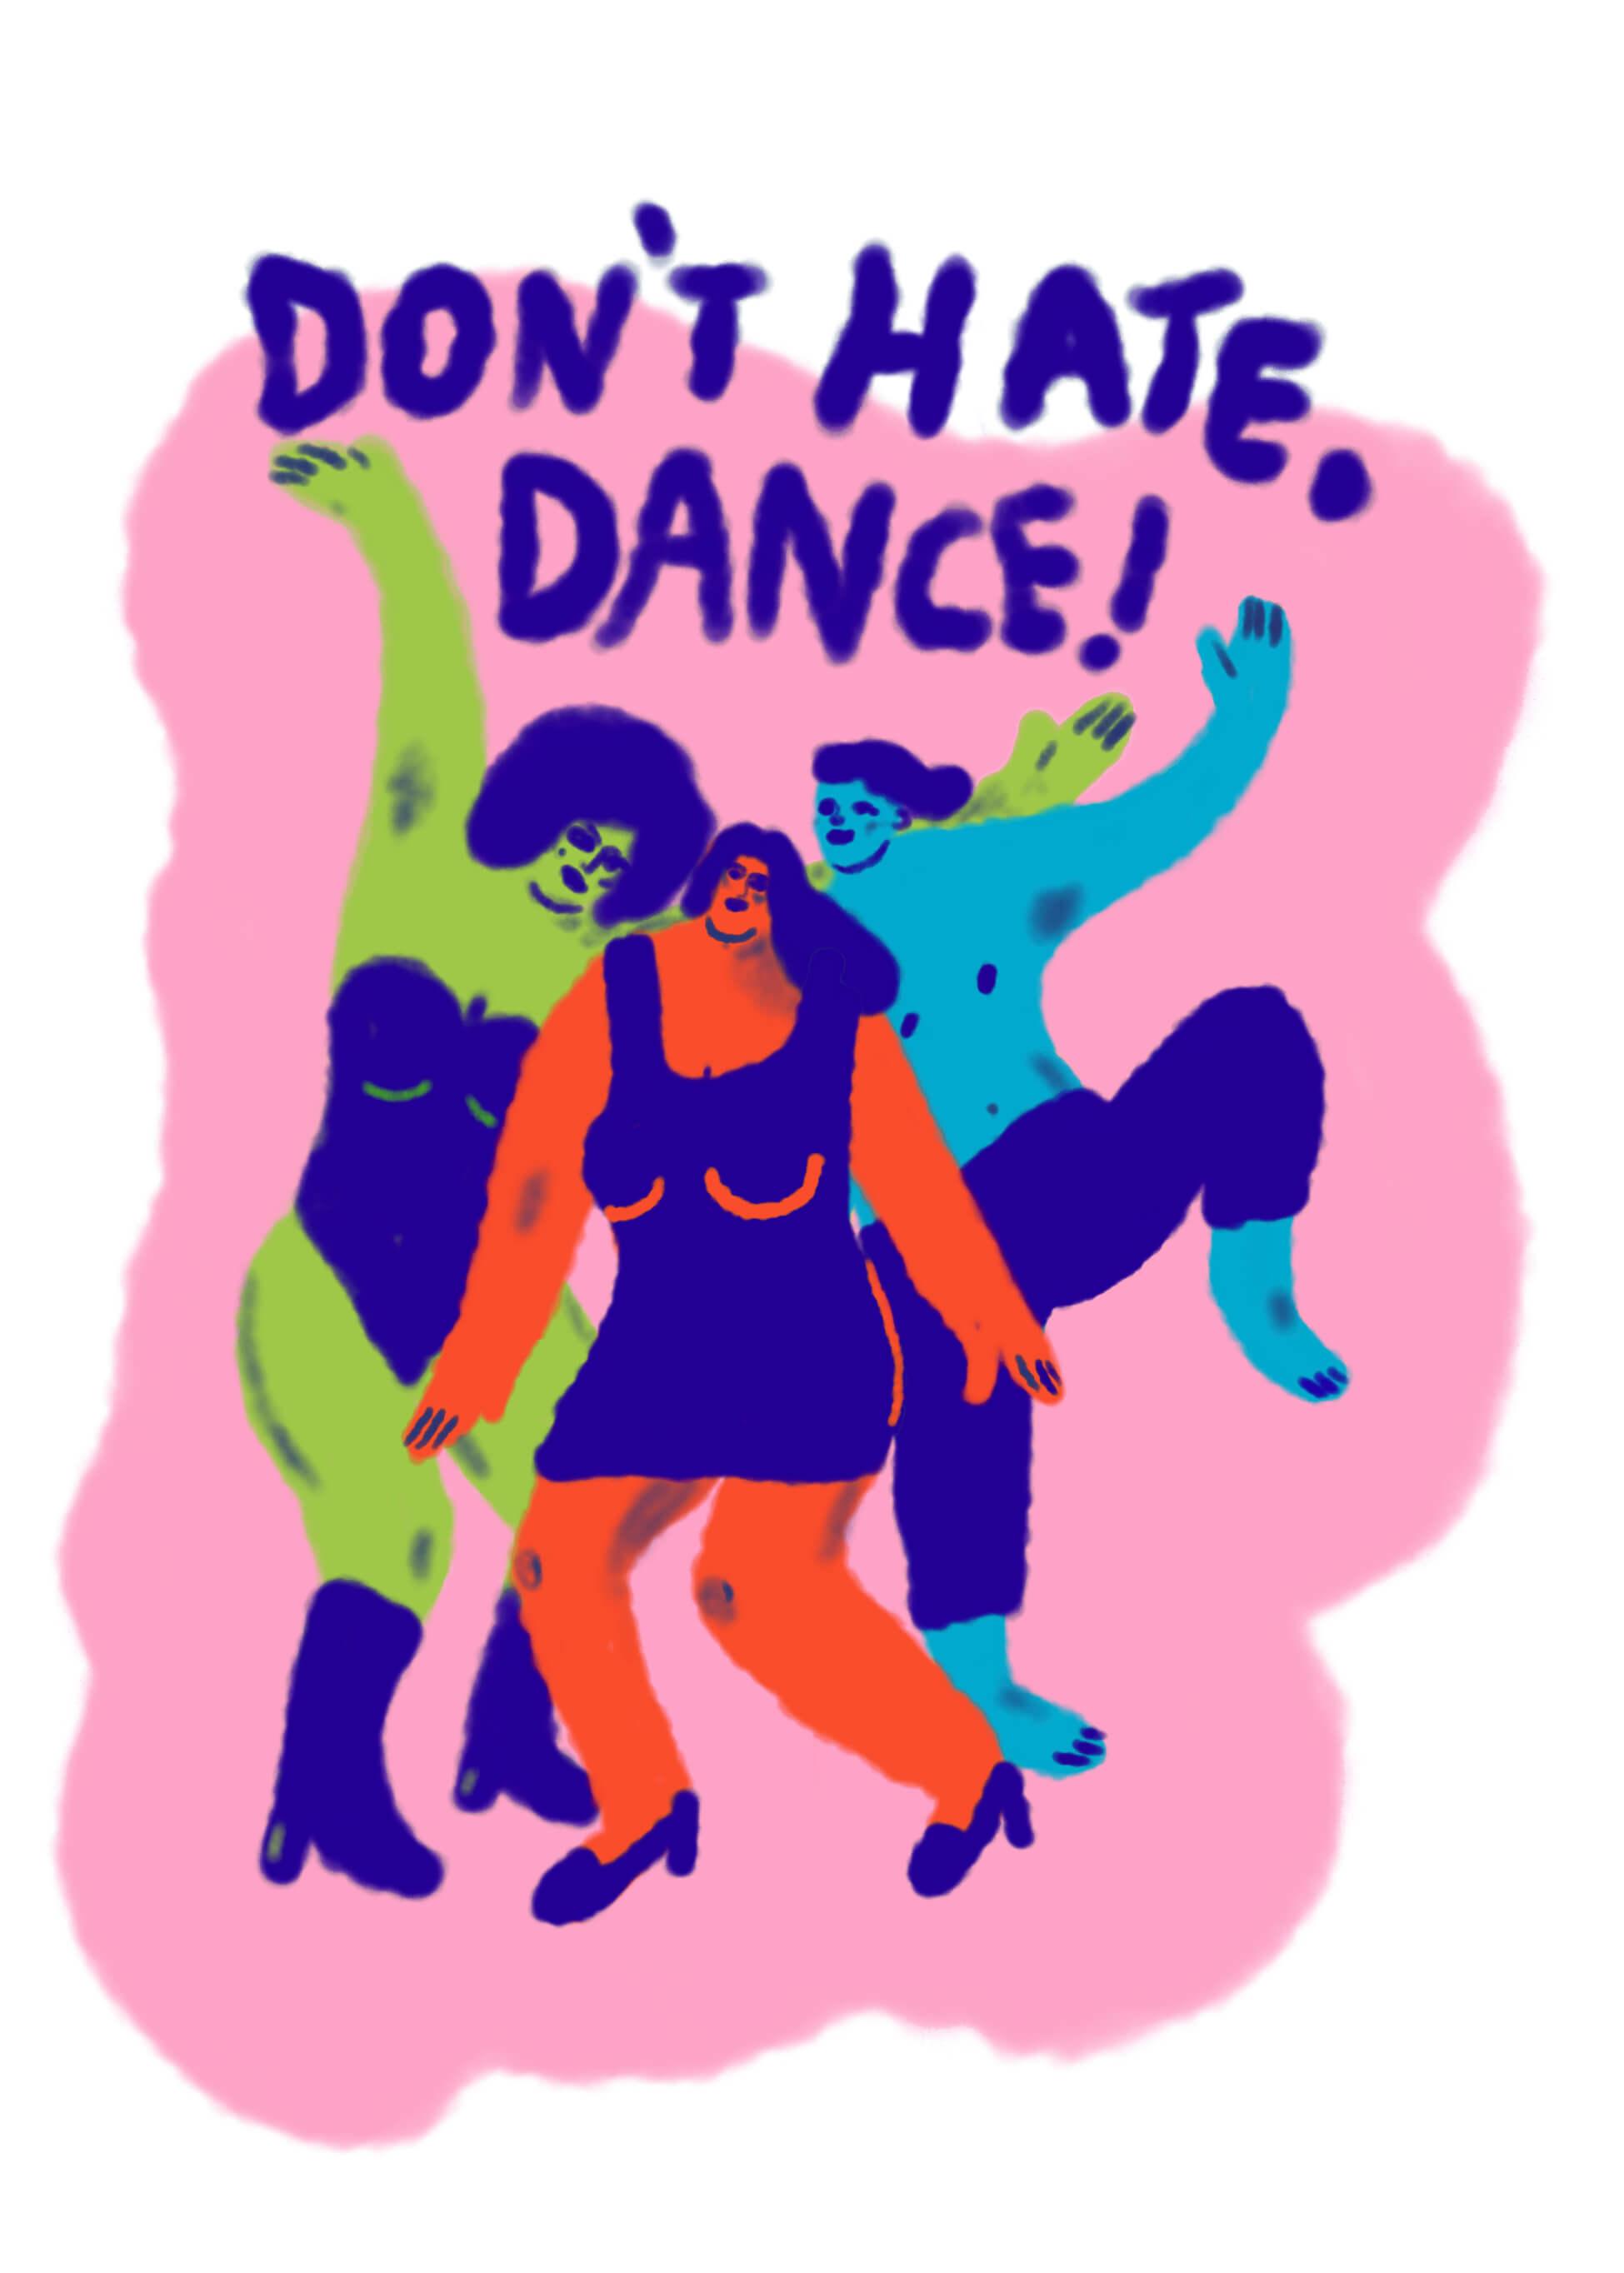 Don't Hate - Dance main image